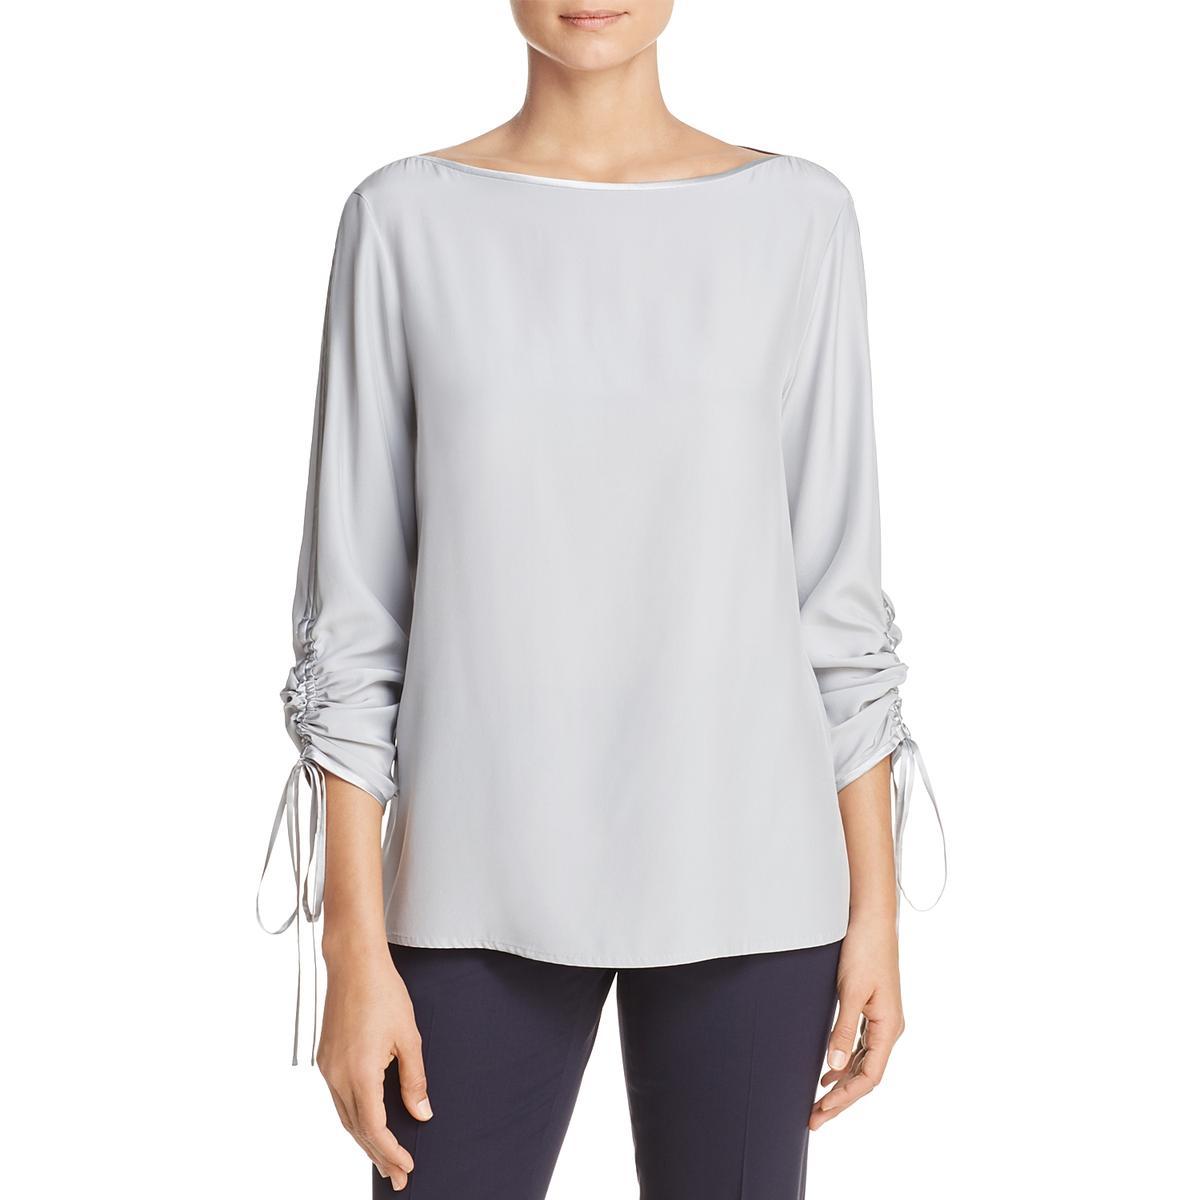 9ef2c9db4ac Details about Lafayette 148 New York Womens Georgina Silk Business Wear  Blouse Shirt BHFO 3270